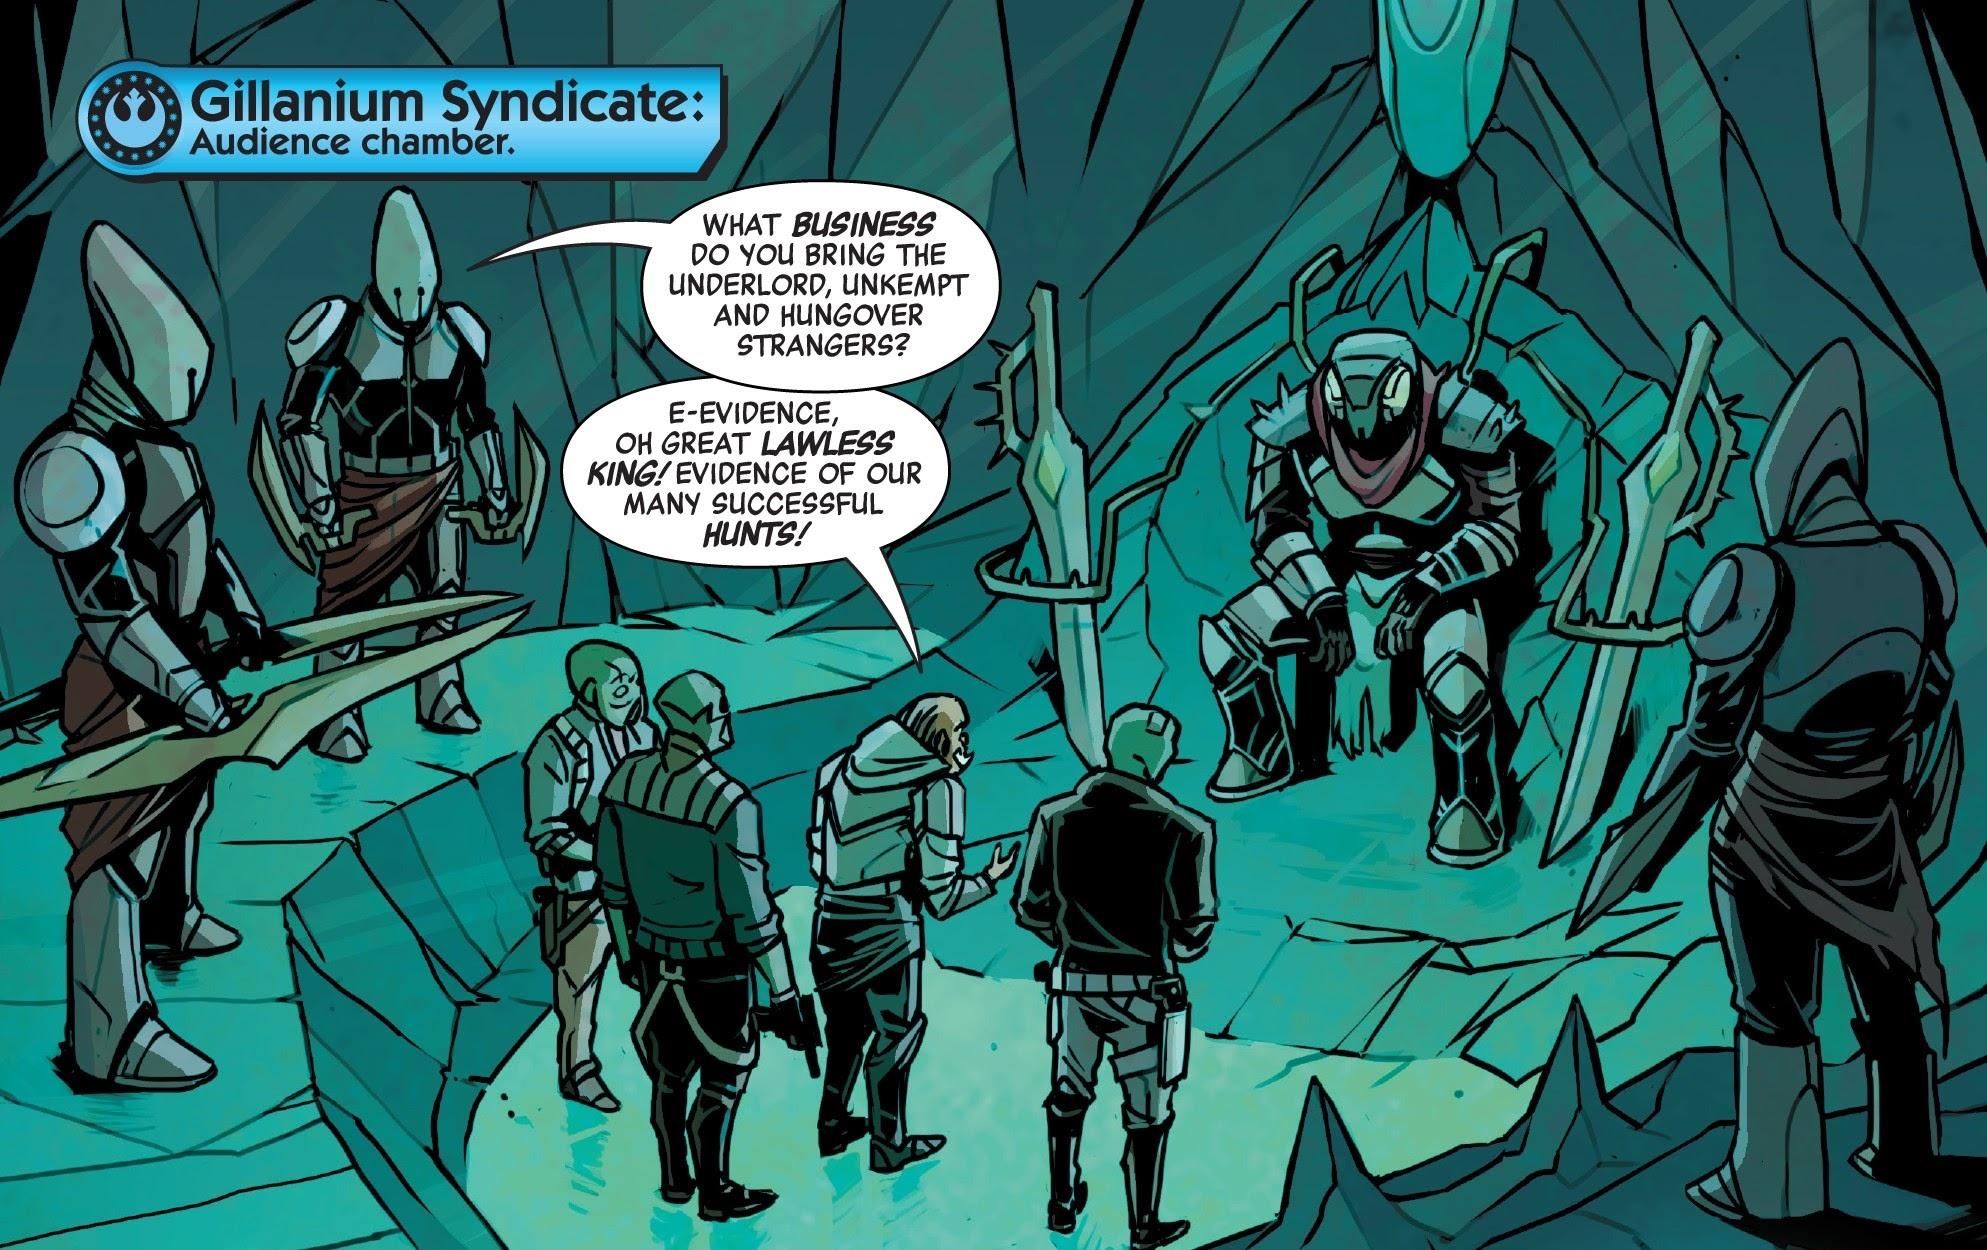 Gillanium Syndicate